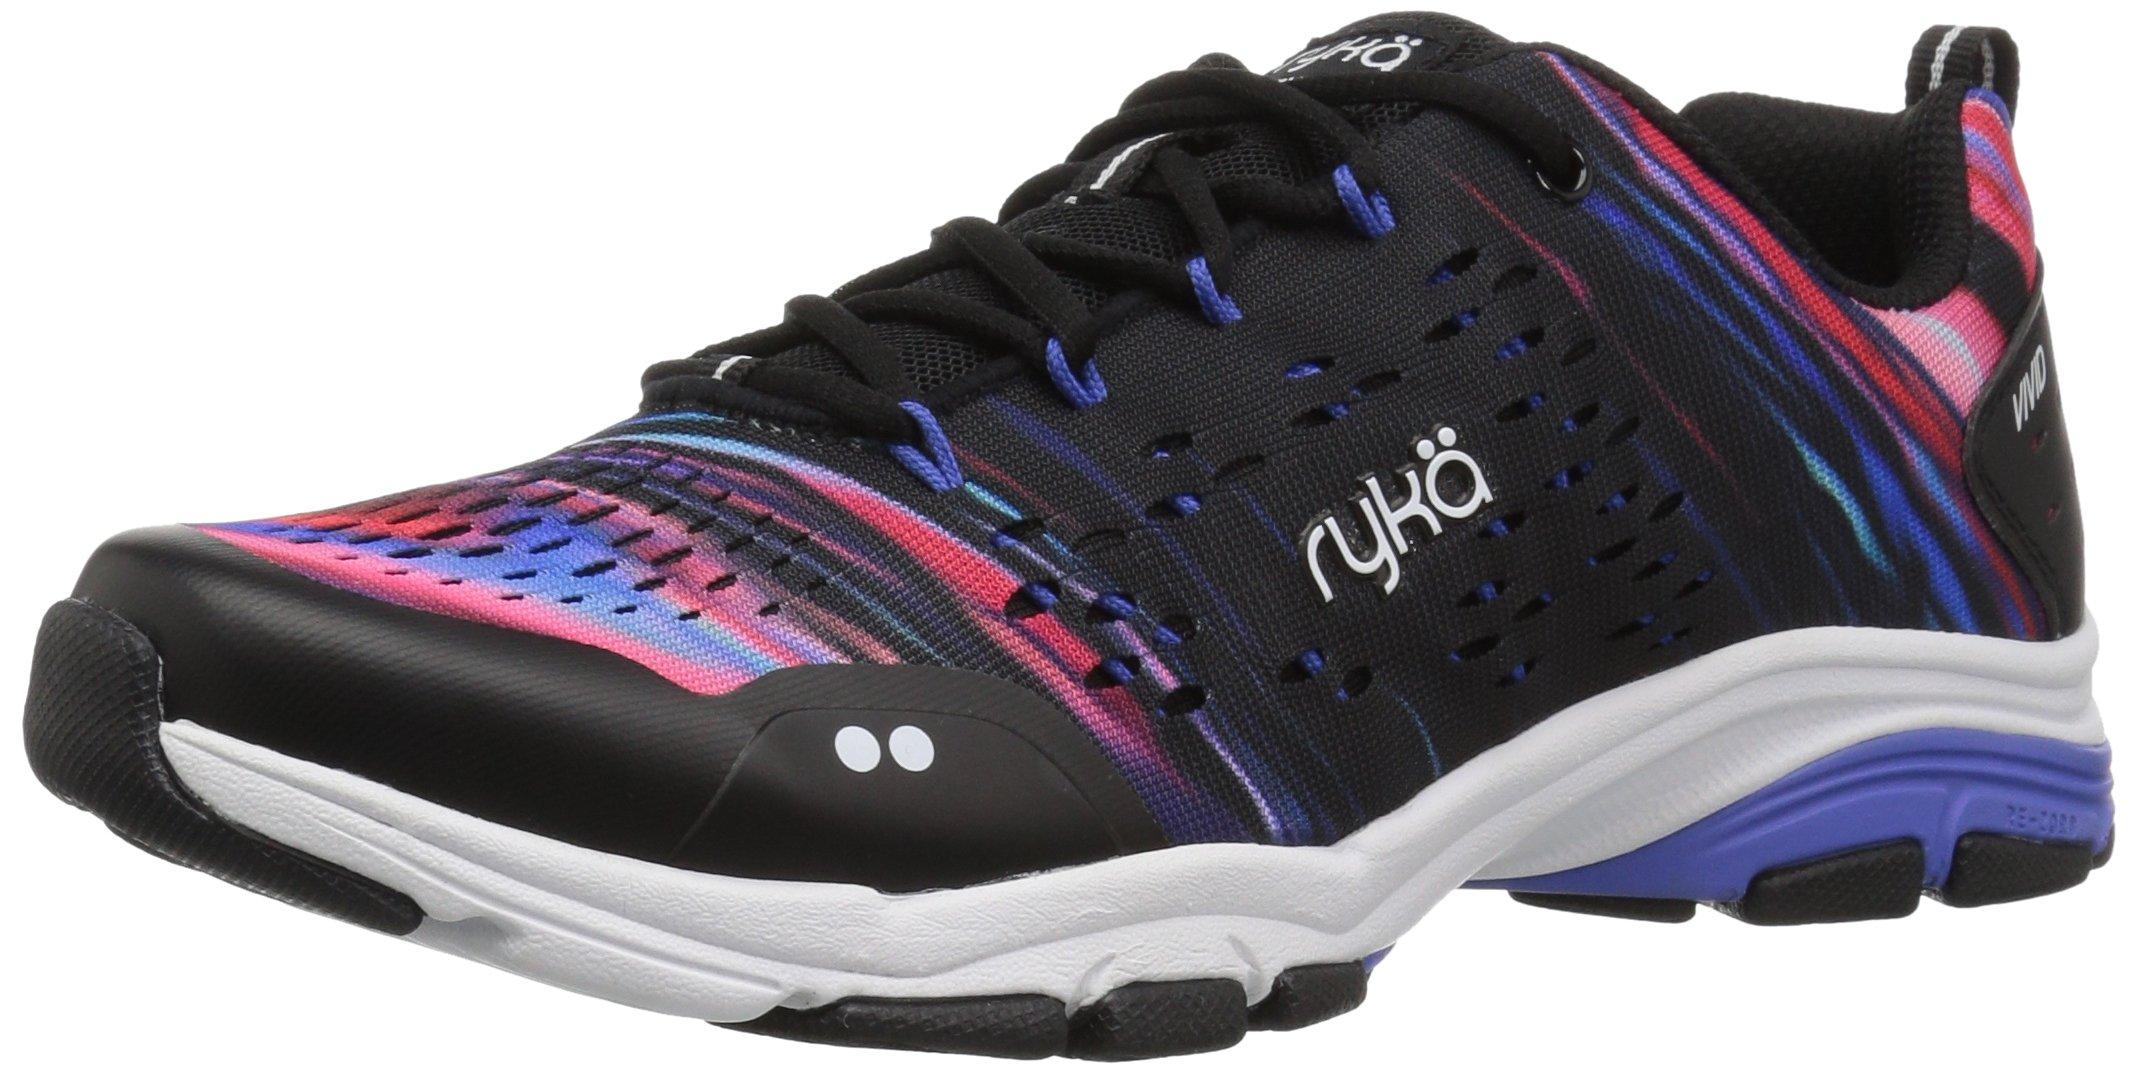 Ryka Women's Vivid RZX Cross Trainer, Black/Multi, 8 M US by Ryka